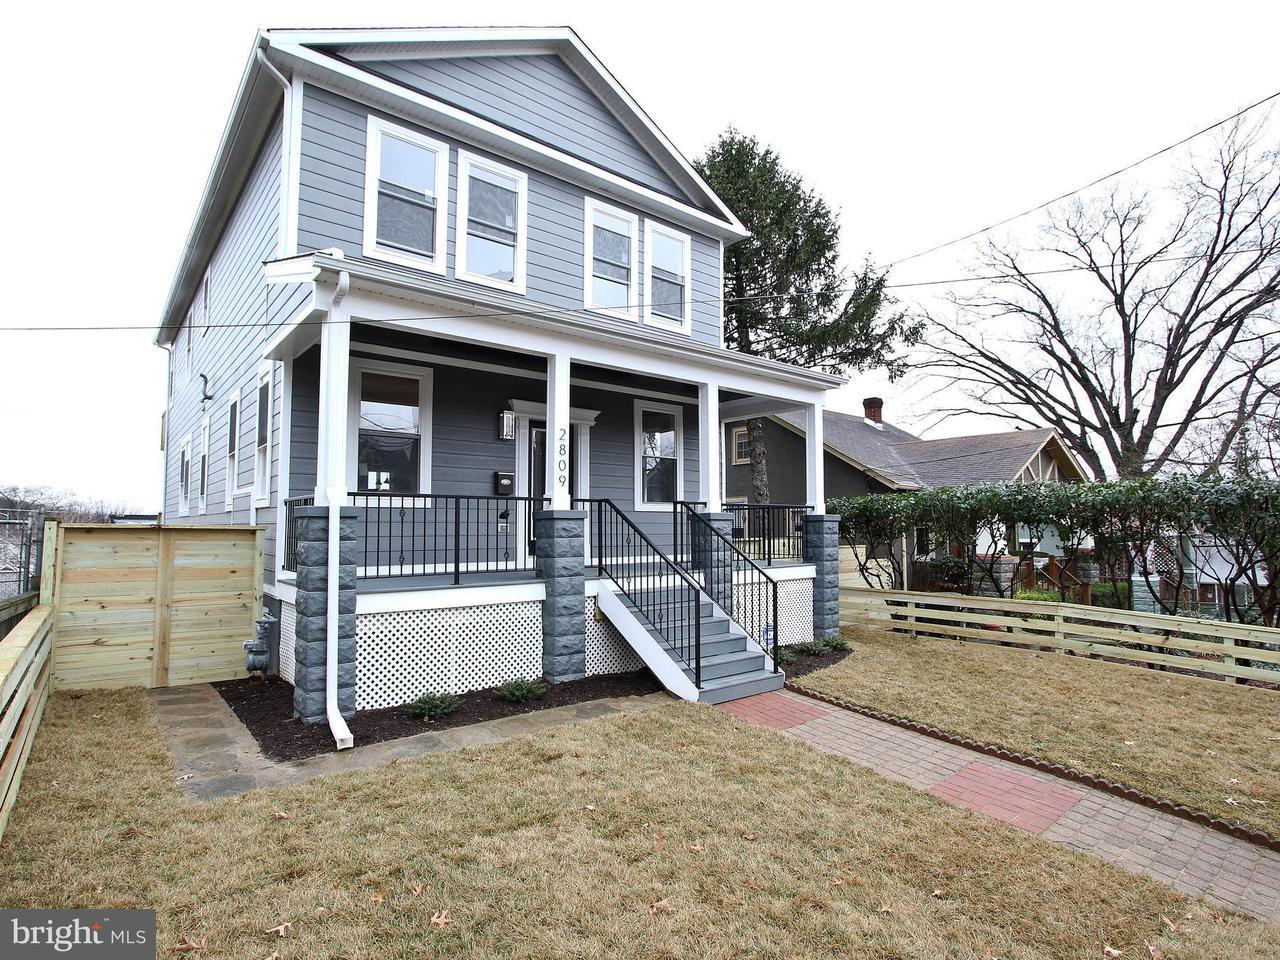 Single Family Home for Sale at 2809 Evarts St Ne 2809 Evarts St Ne Washington, District Of Columbia 20018 United States